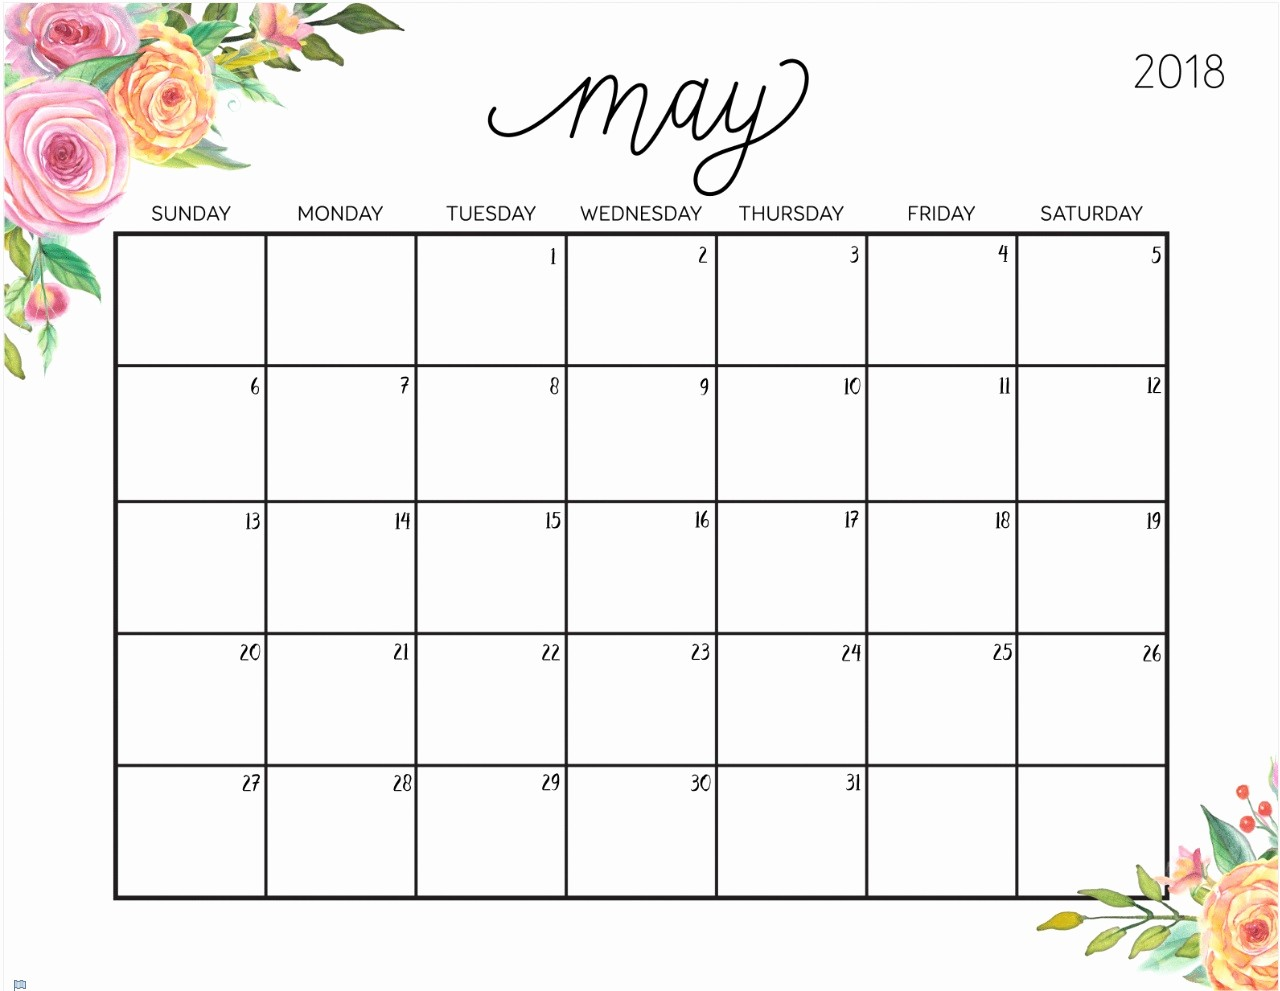 Free May 2018 Calendar Template Elegant Free Printable 2018 Calendar with Weekly Planner